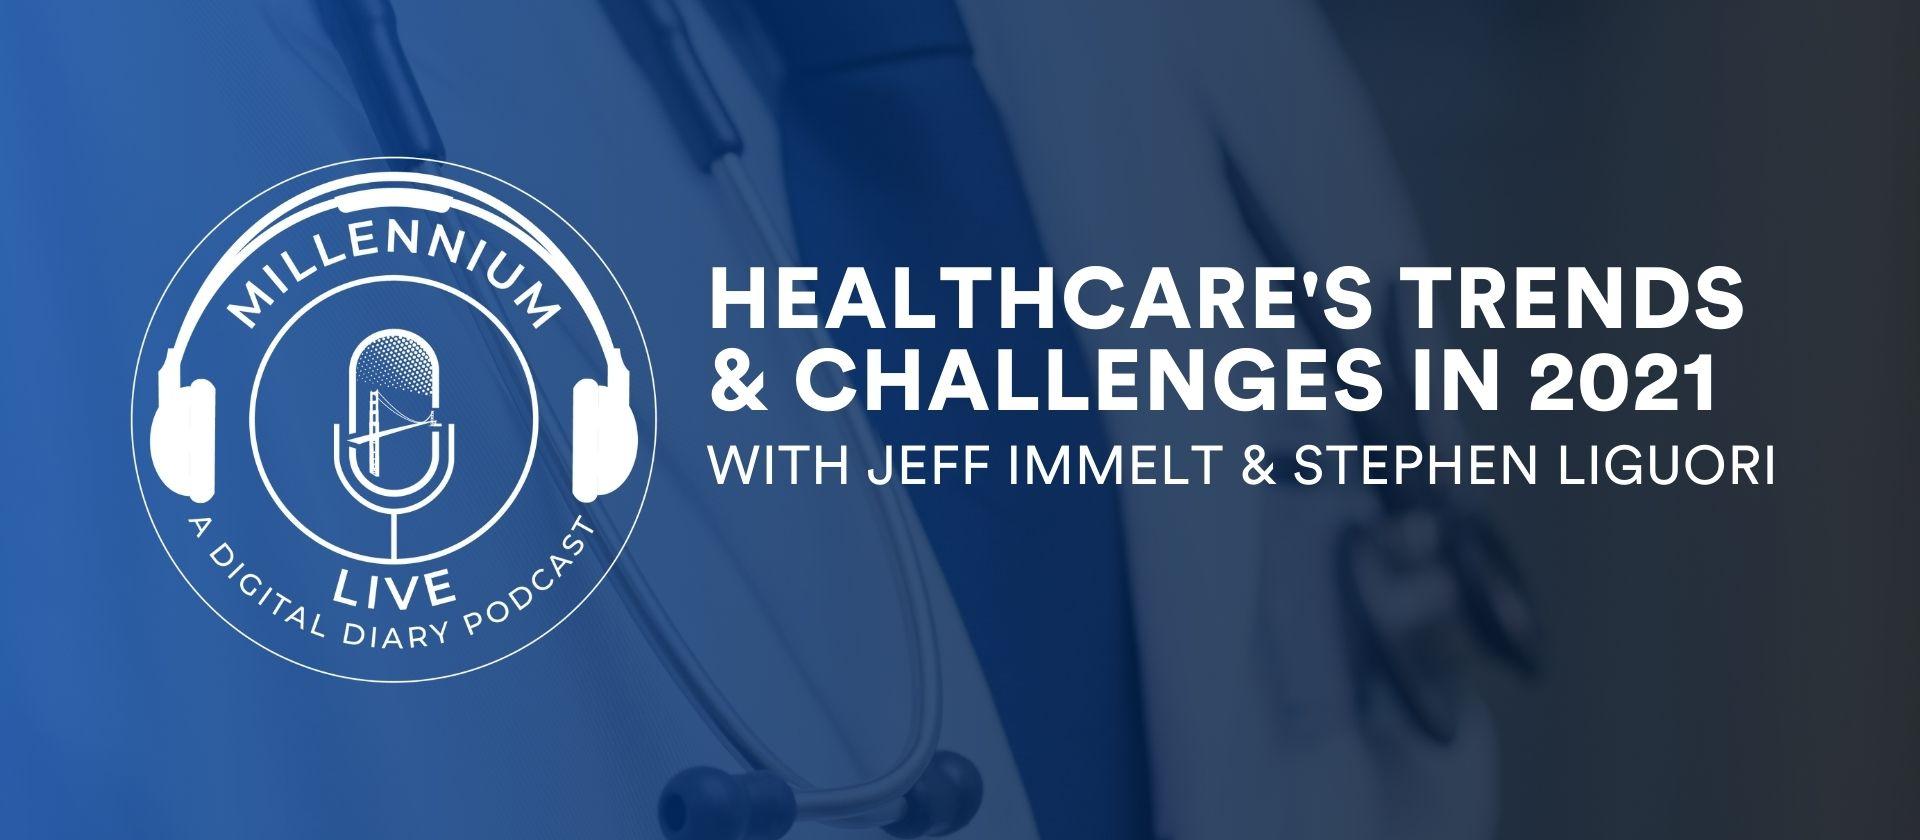 Healthcare Trends & Challenges in 2021